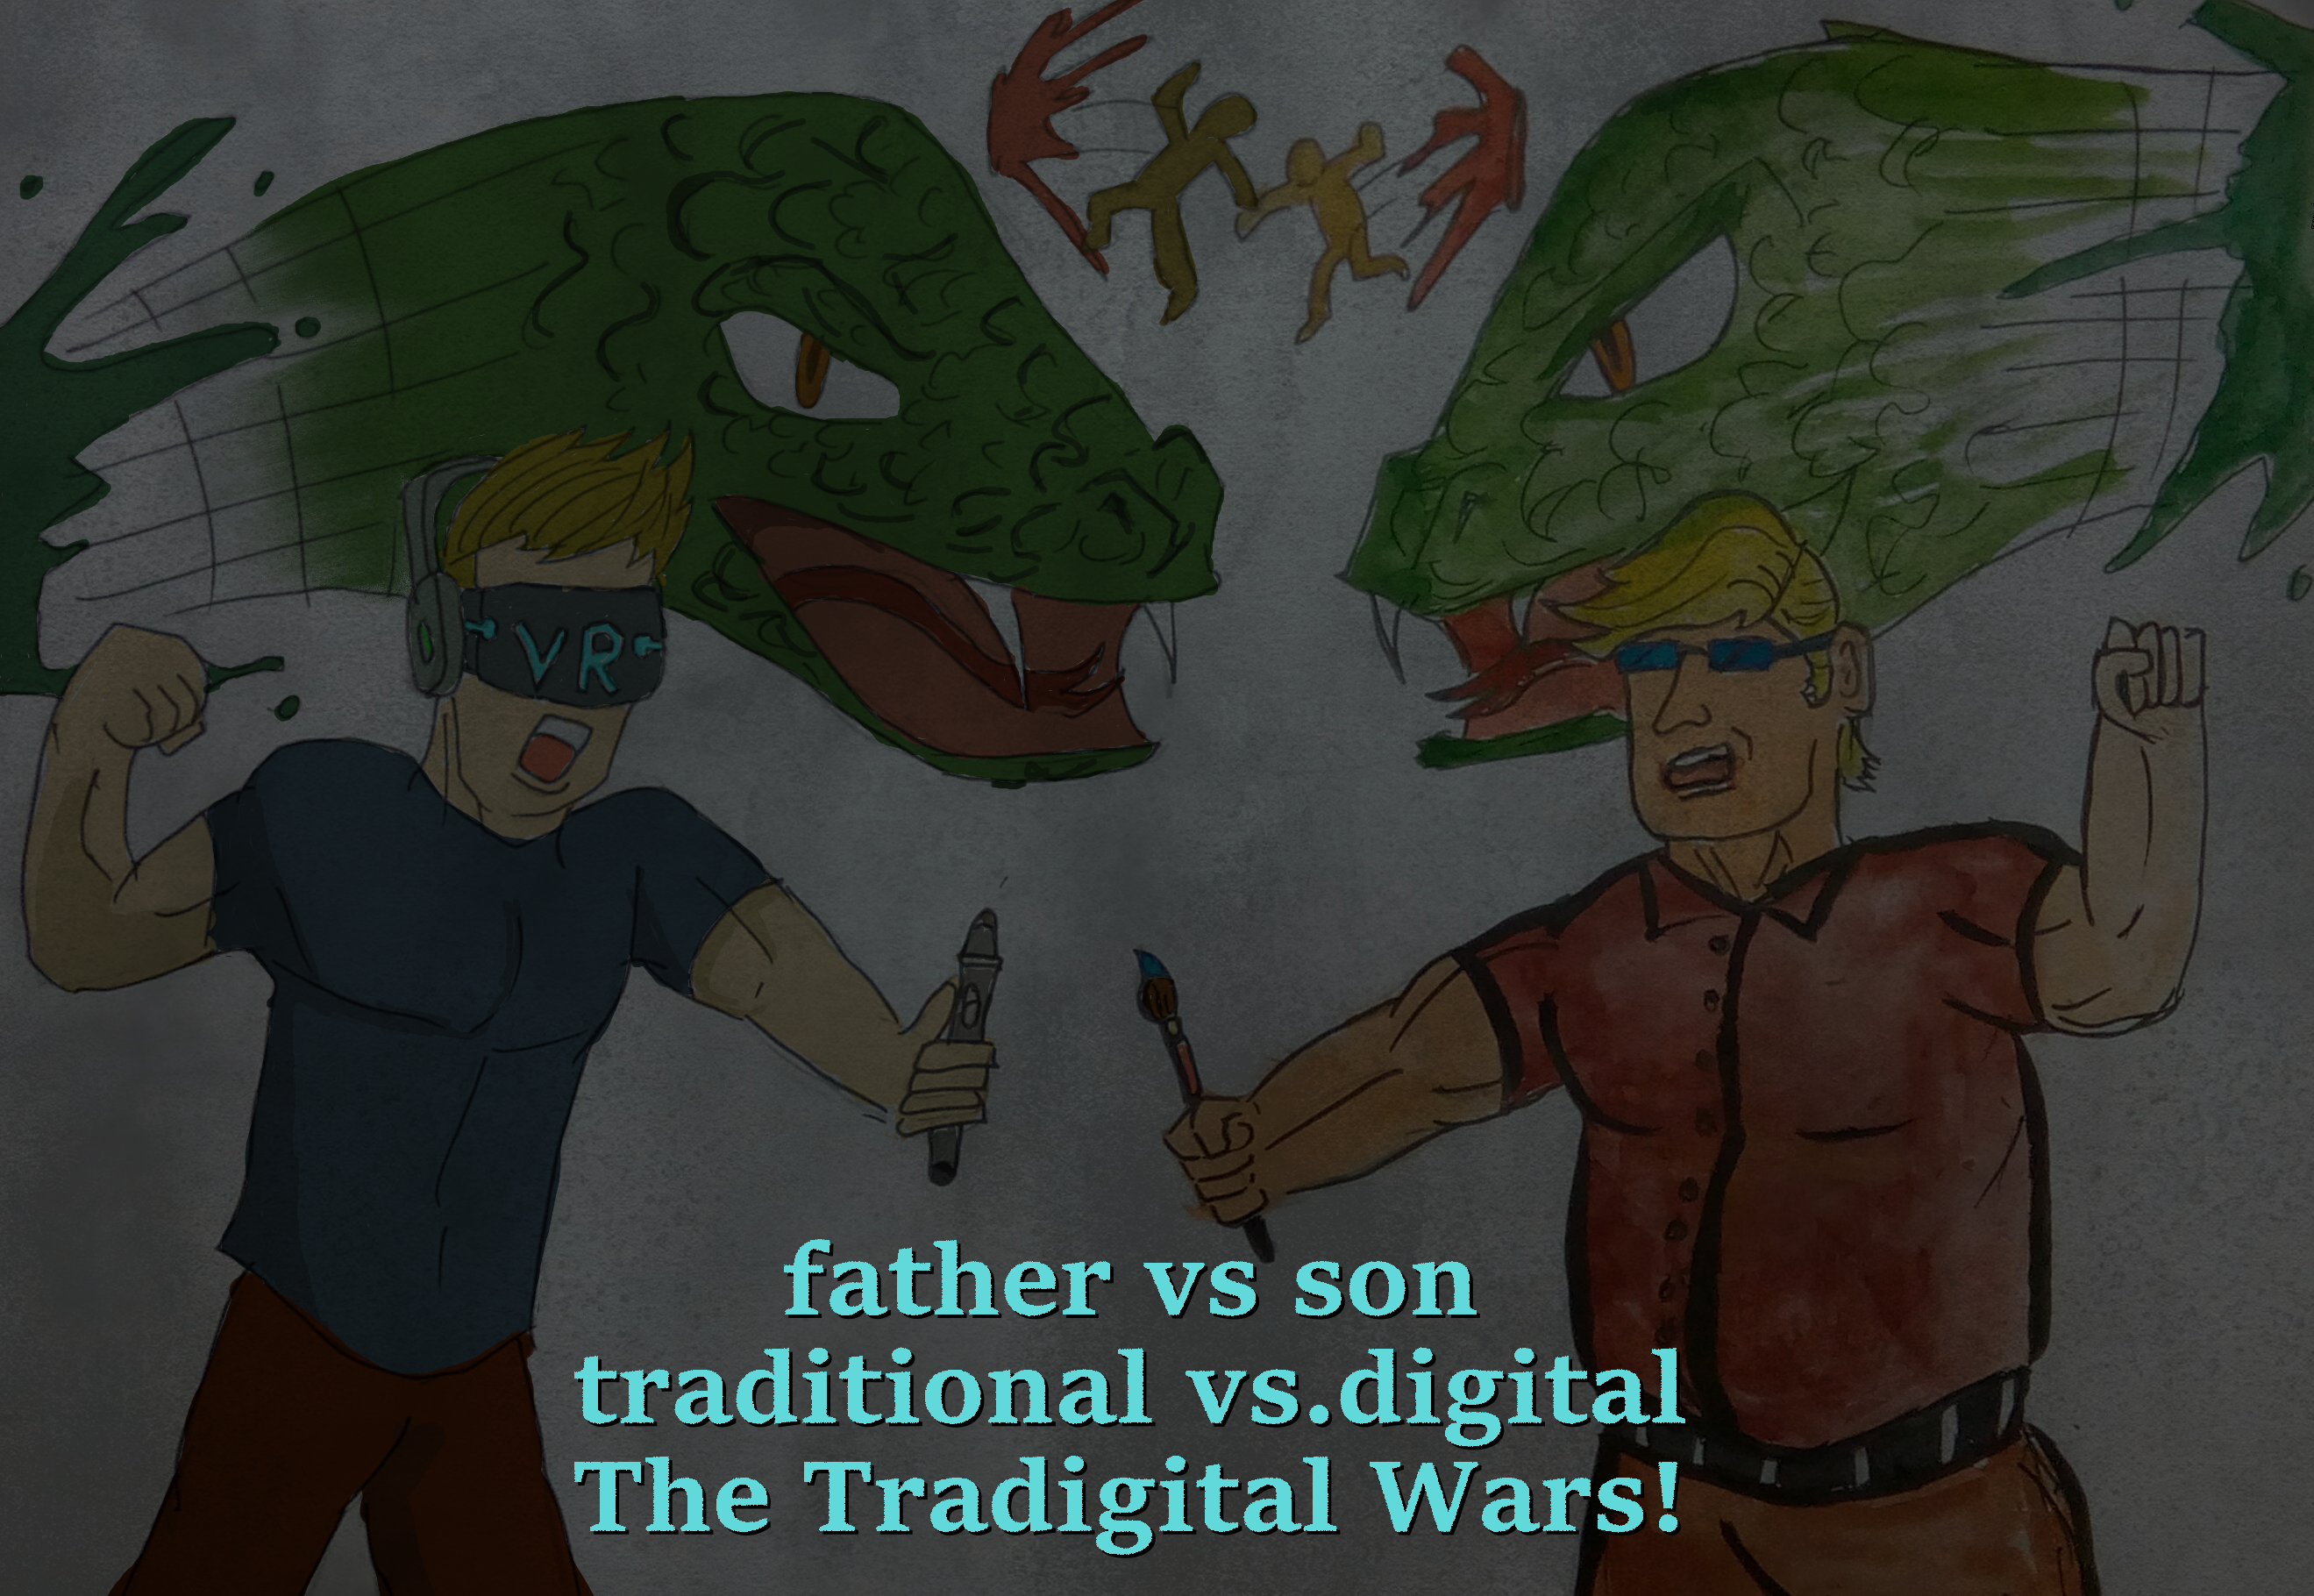 The Tradigital Wars